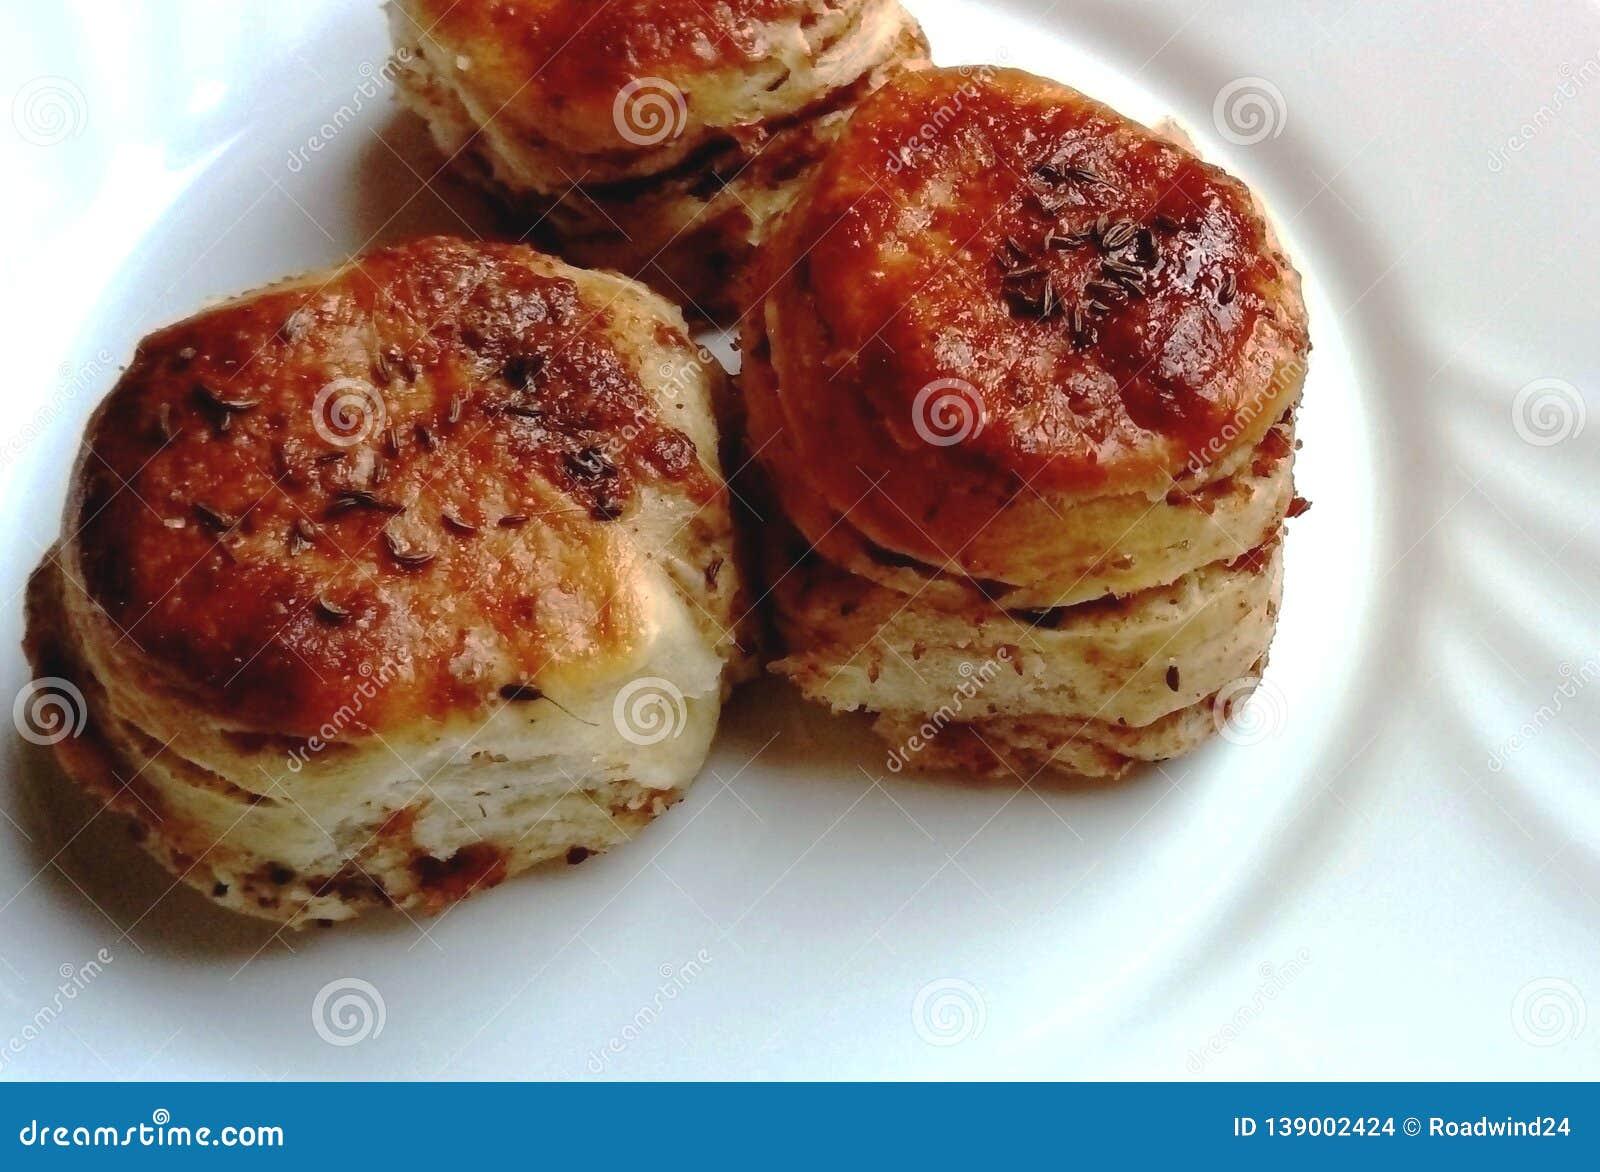 Perfectly baked pork rind cookies